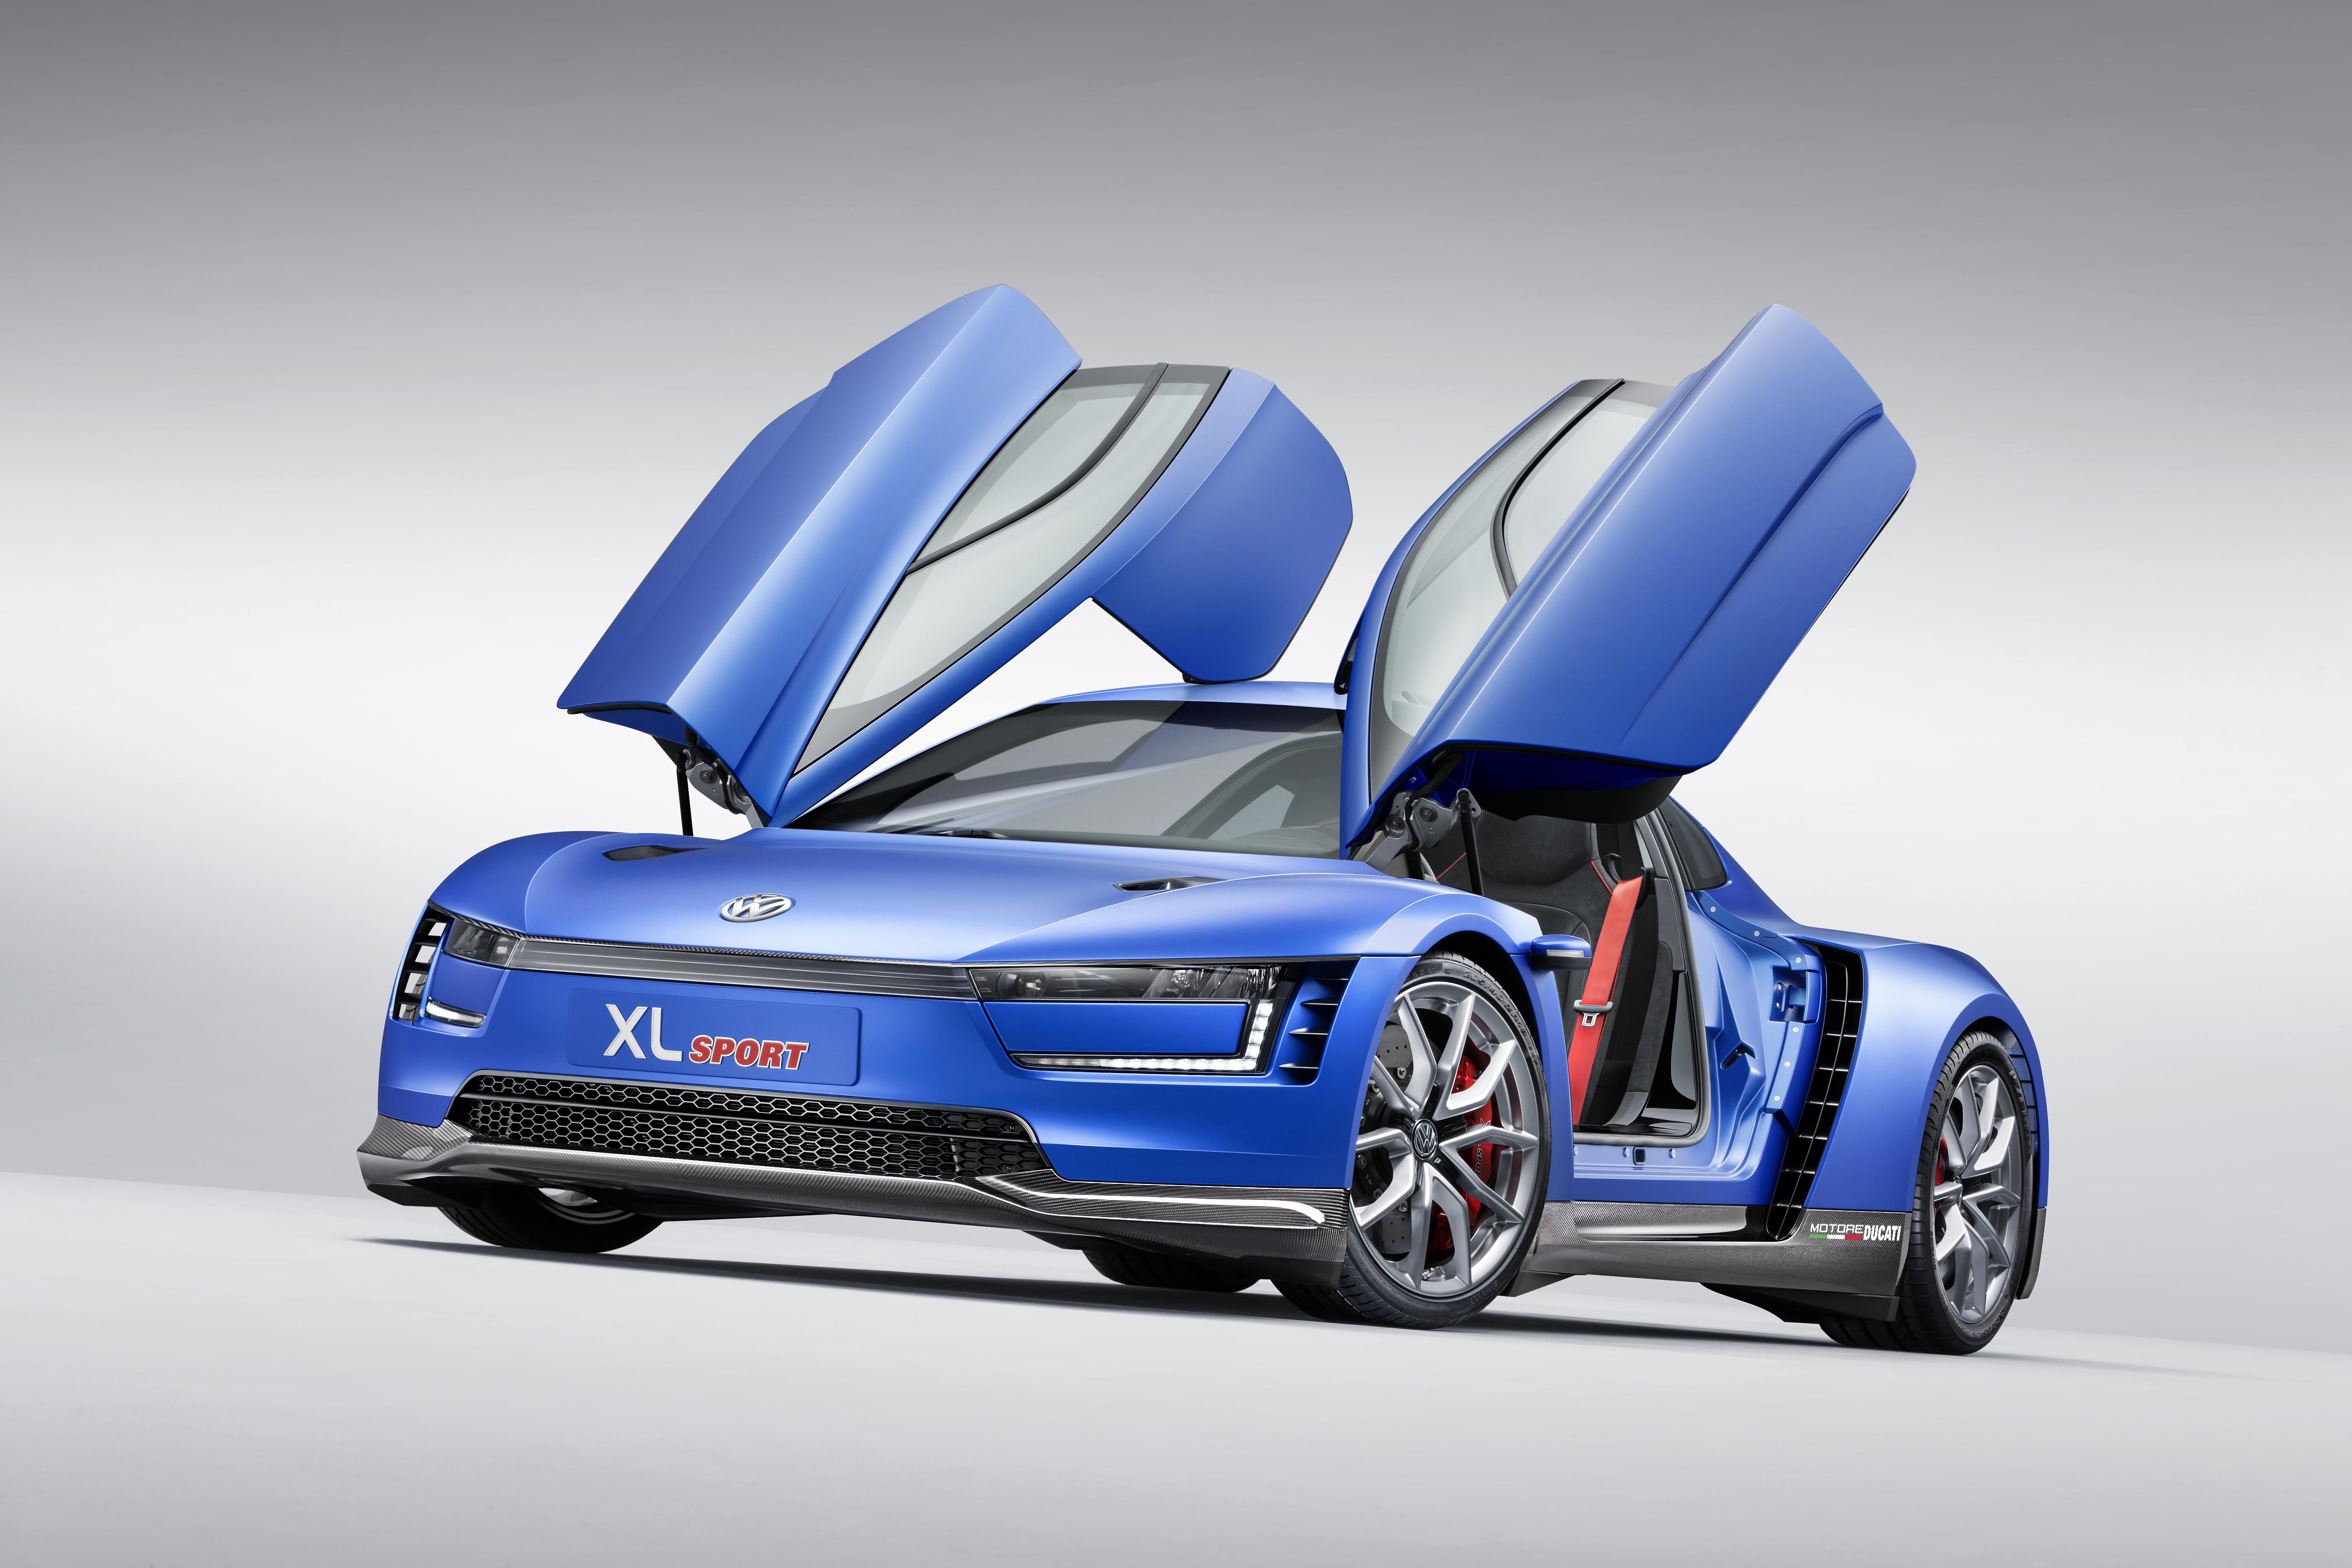 Volkswagen Xl1 Sport Ibrida Da Competizione Grazie A Ducati